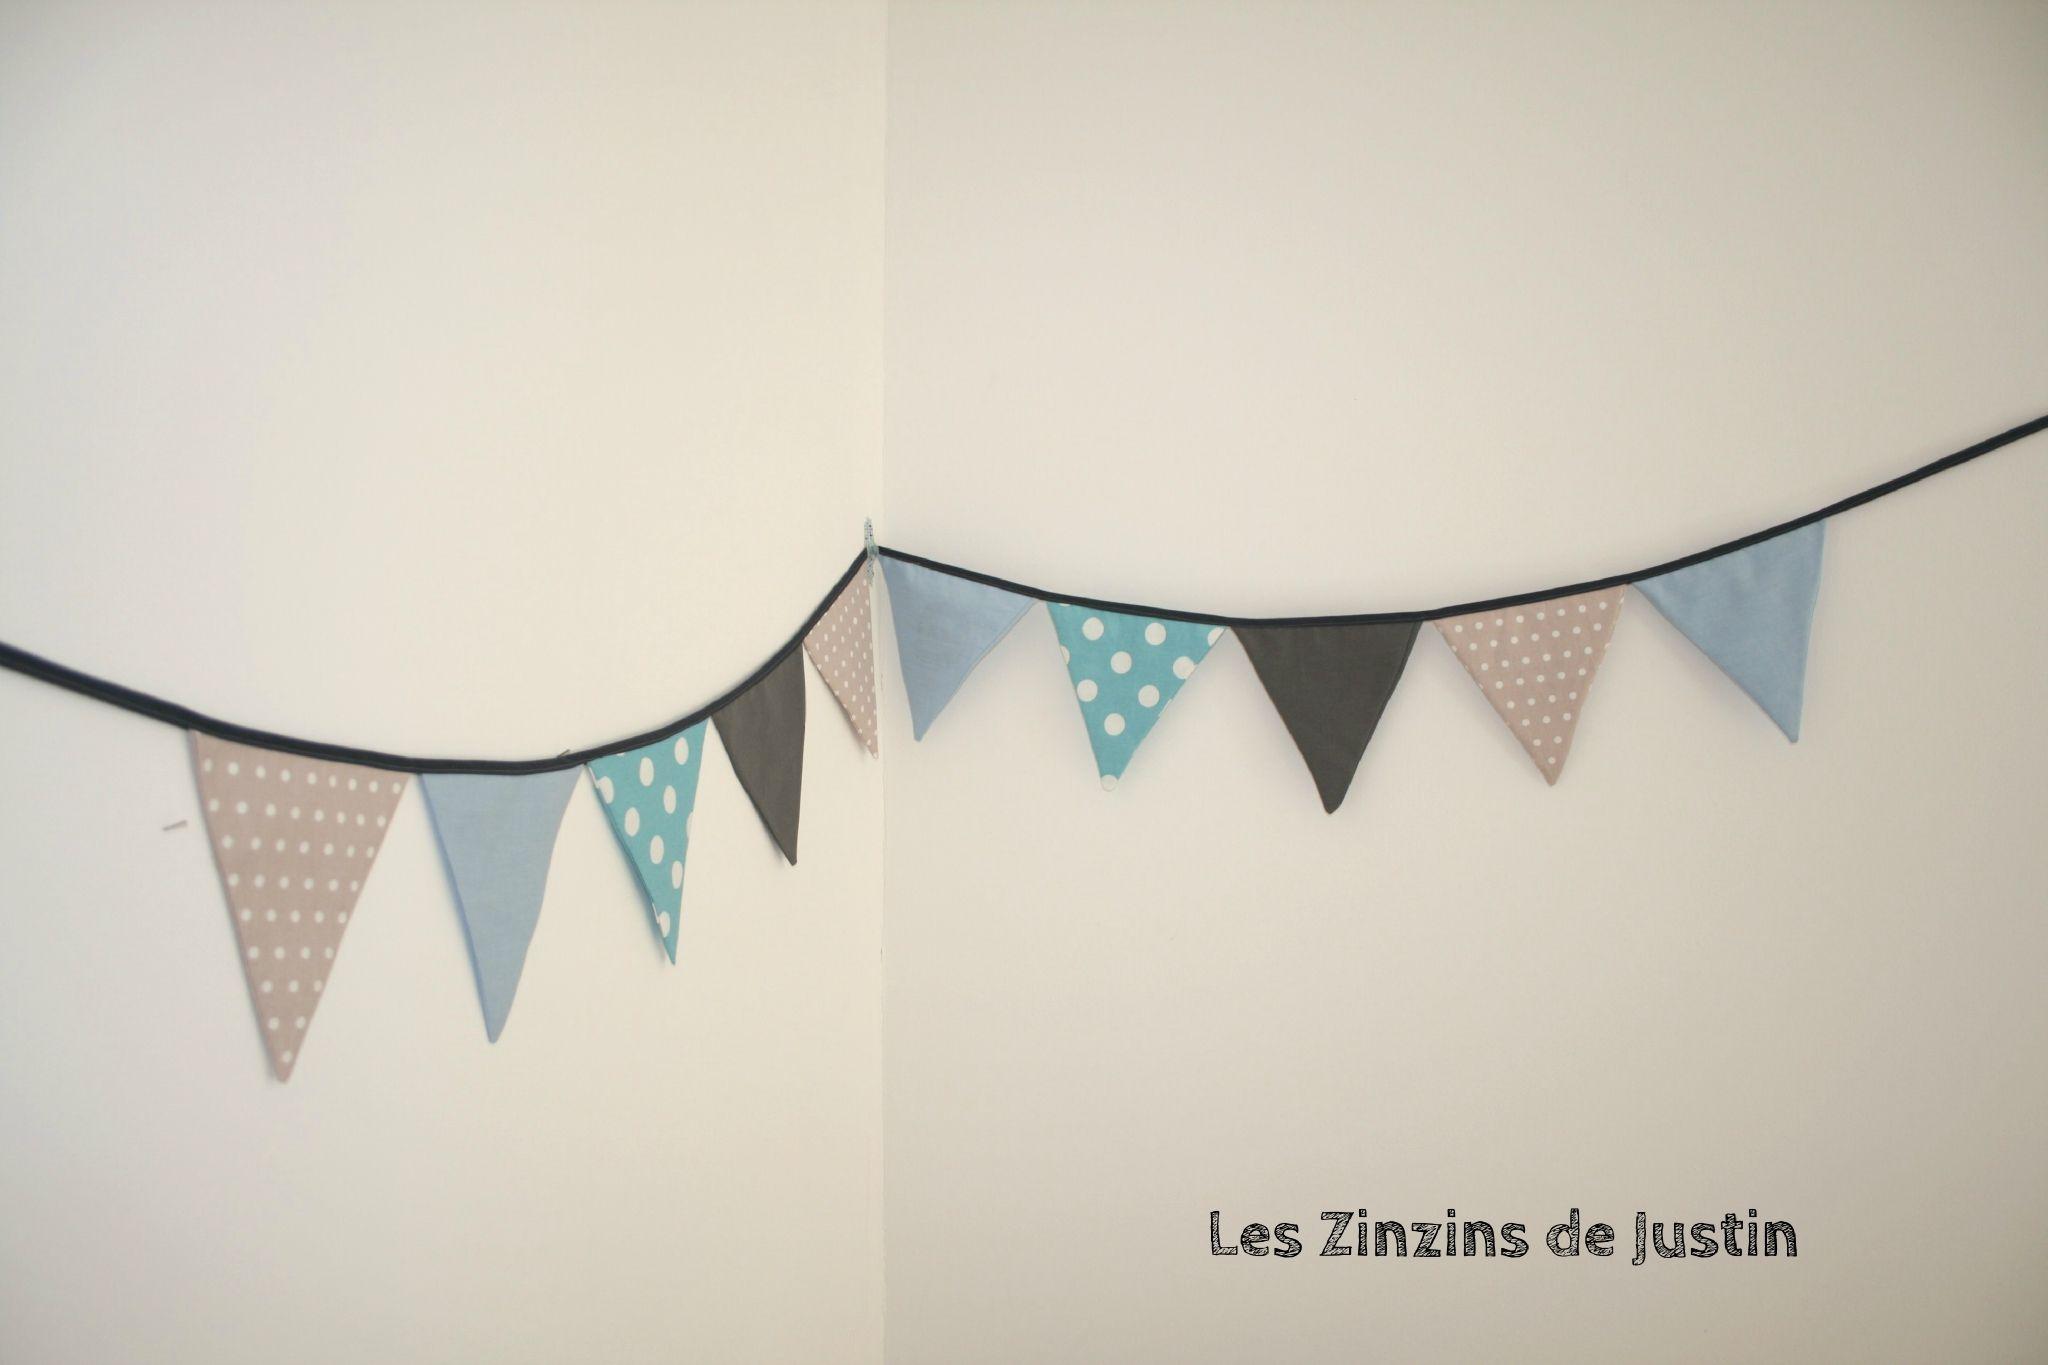 Guirlande fanion taupe bleu turquoise et gris chambre bb baby bedroom baby boy et baby room - Fanion deco chambre ...